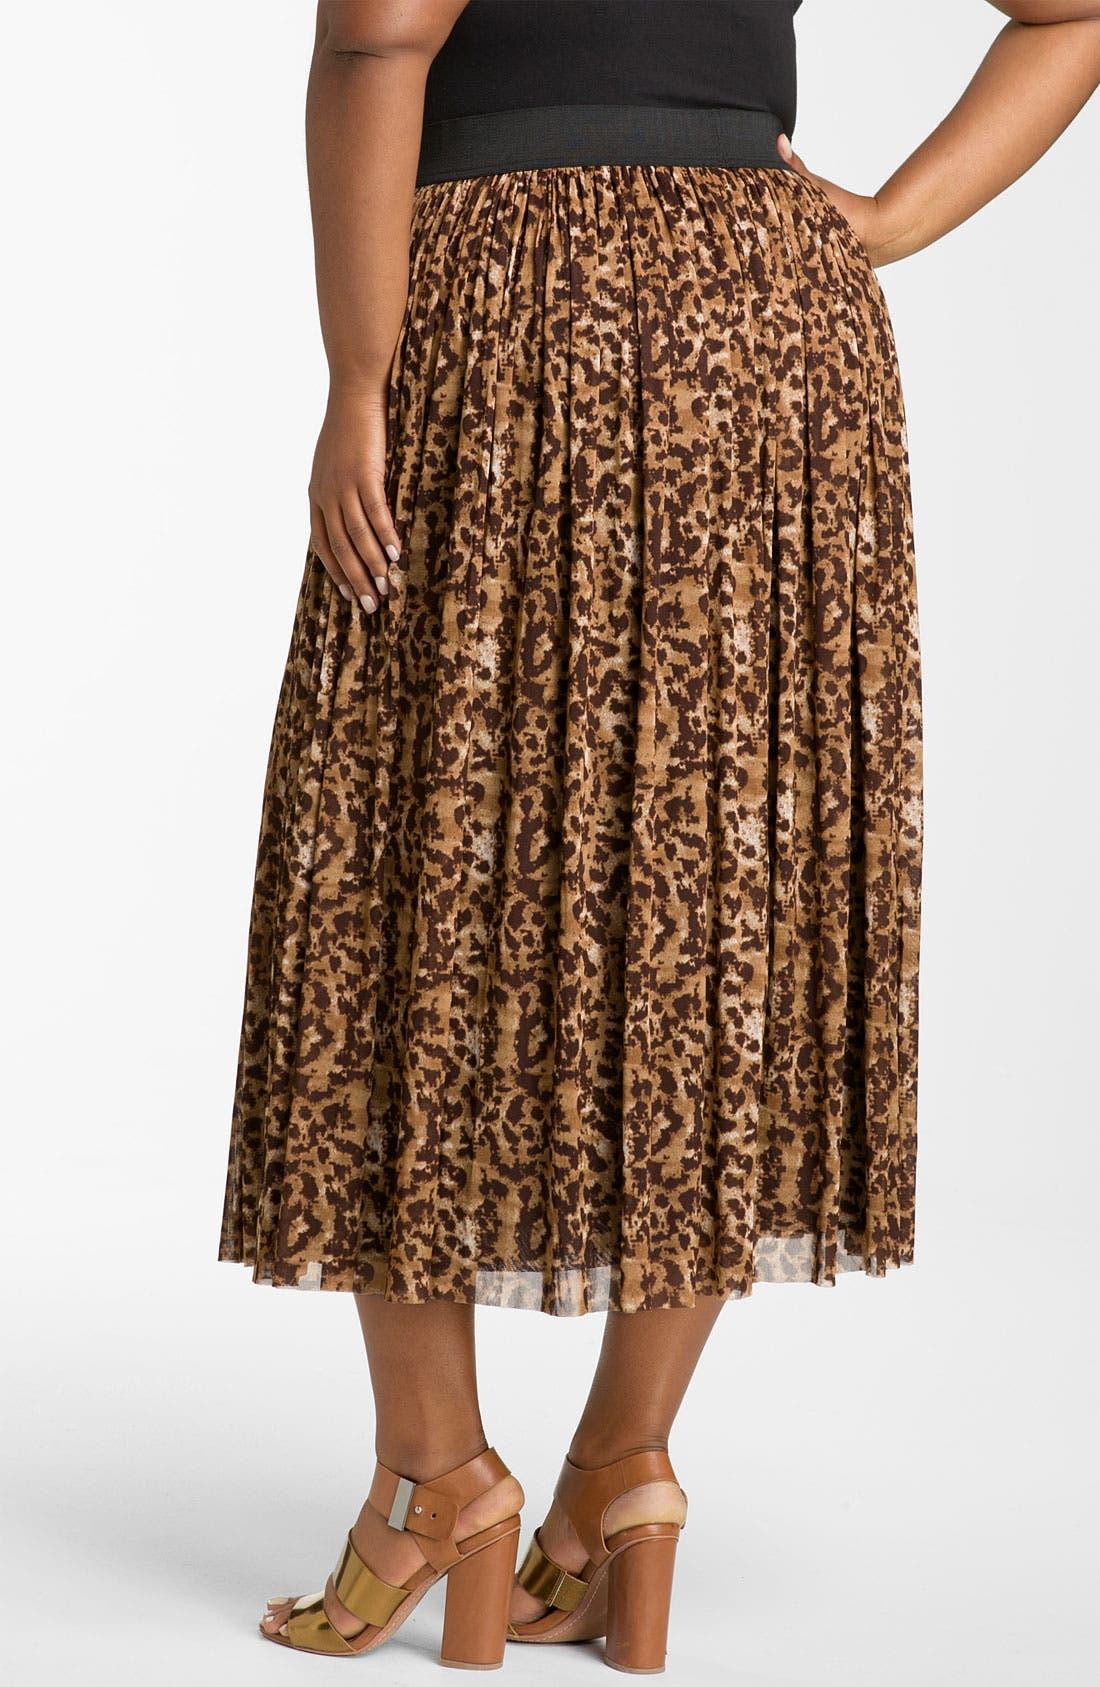 Alternate Image 2  - Vince Camuto 'Textured Spots' Animal Print Skirt (Plus)